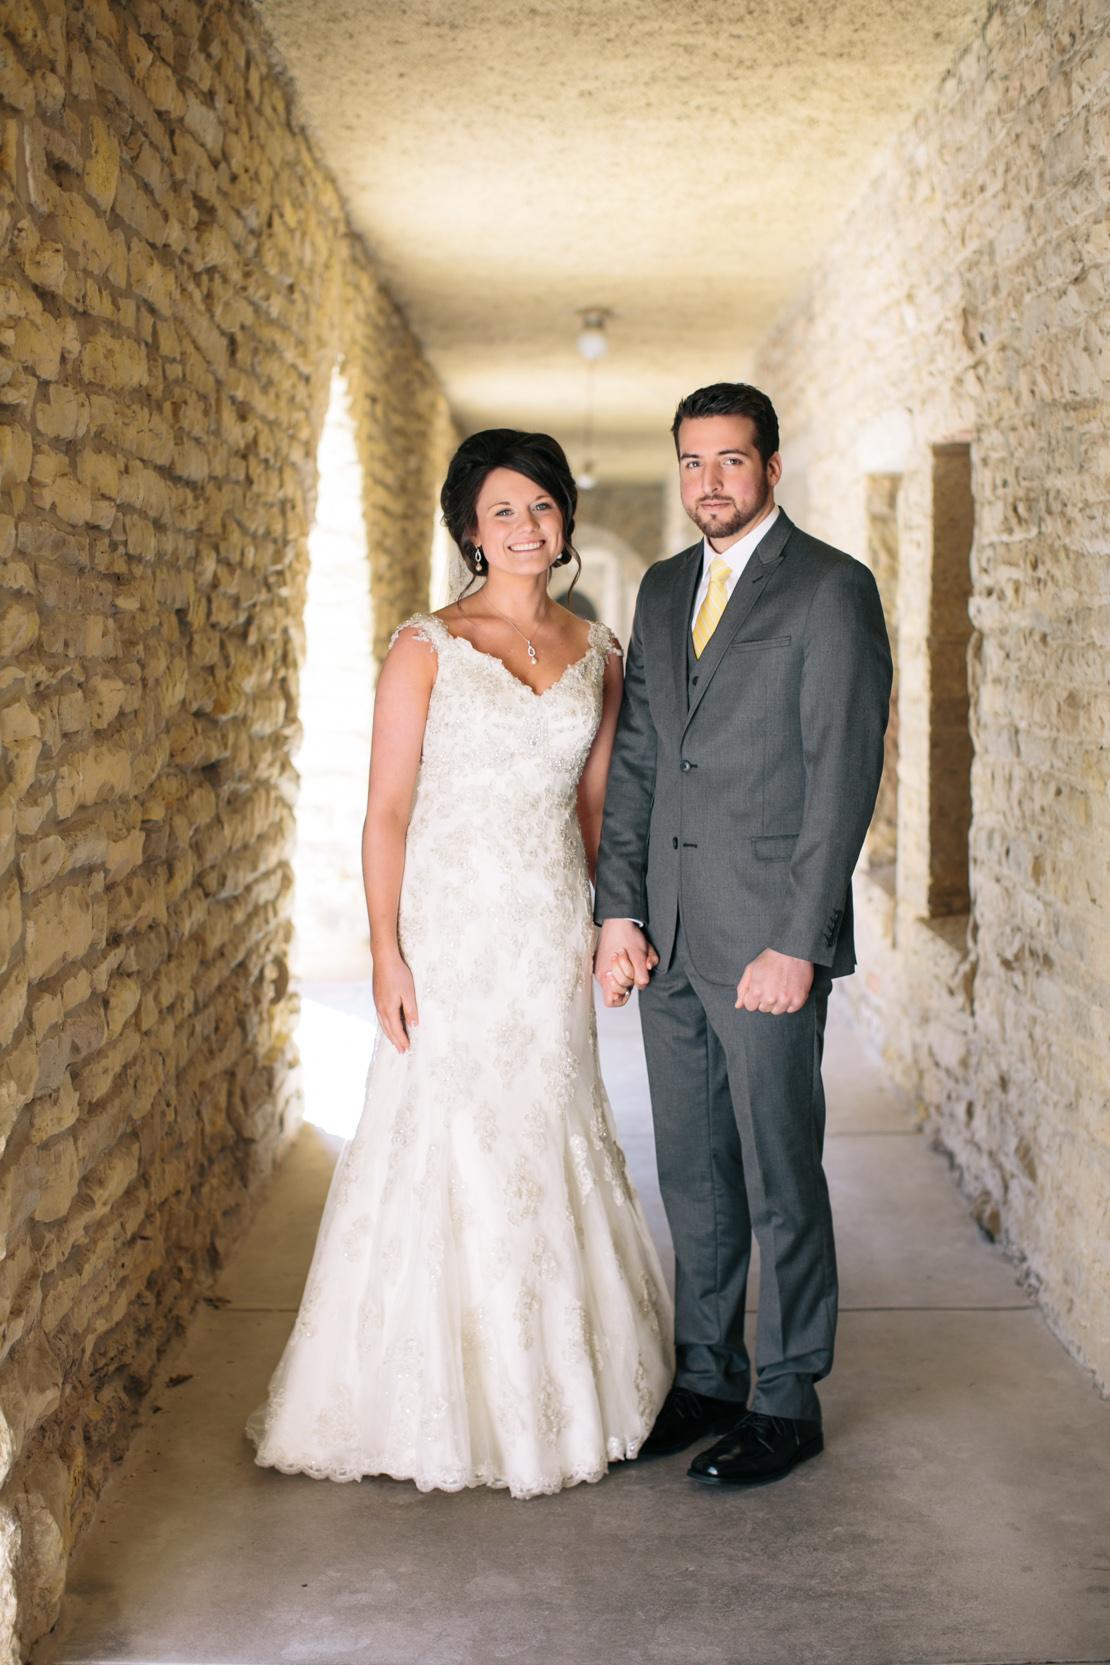 Steph-Thad-Wisconsin-Wedding_Grain-and-Compass-34.jpg